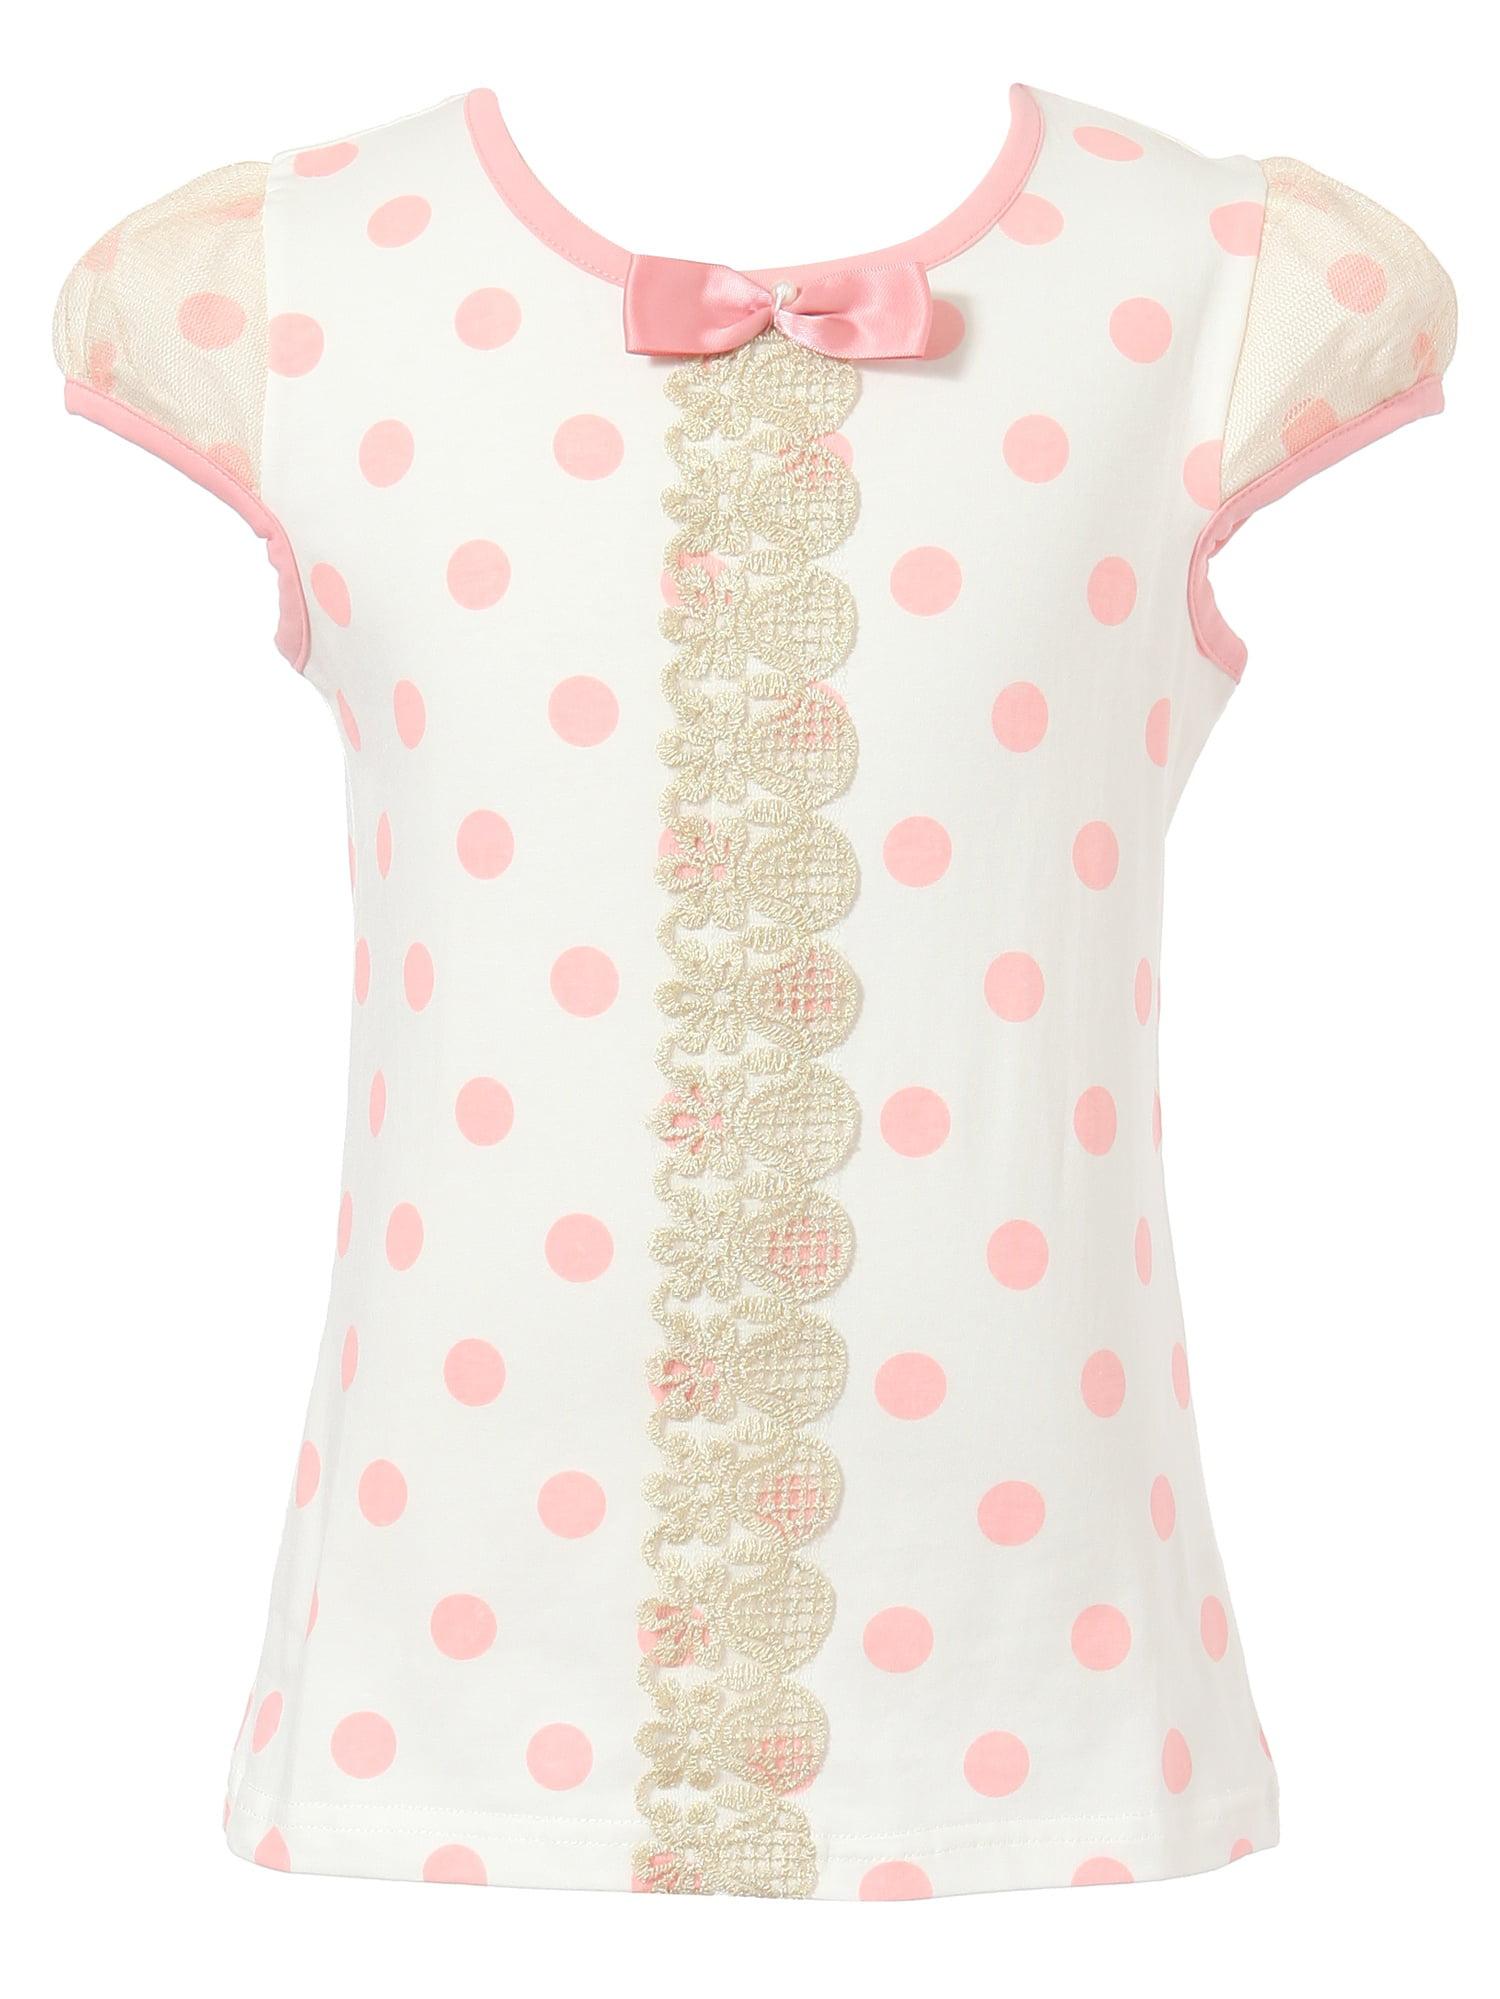 Richie House Girls' Polka Dot Short Sleeve T-shirt with Bow RH1633